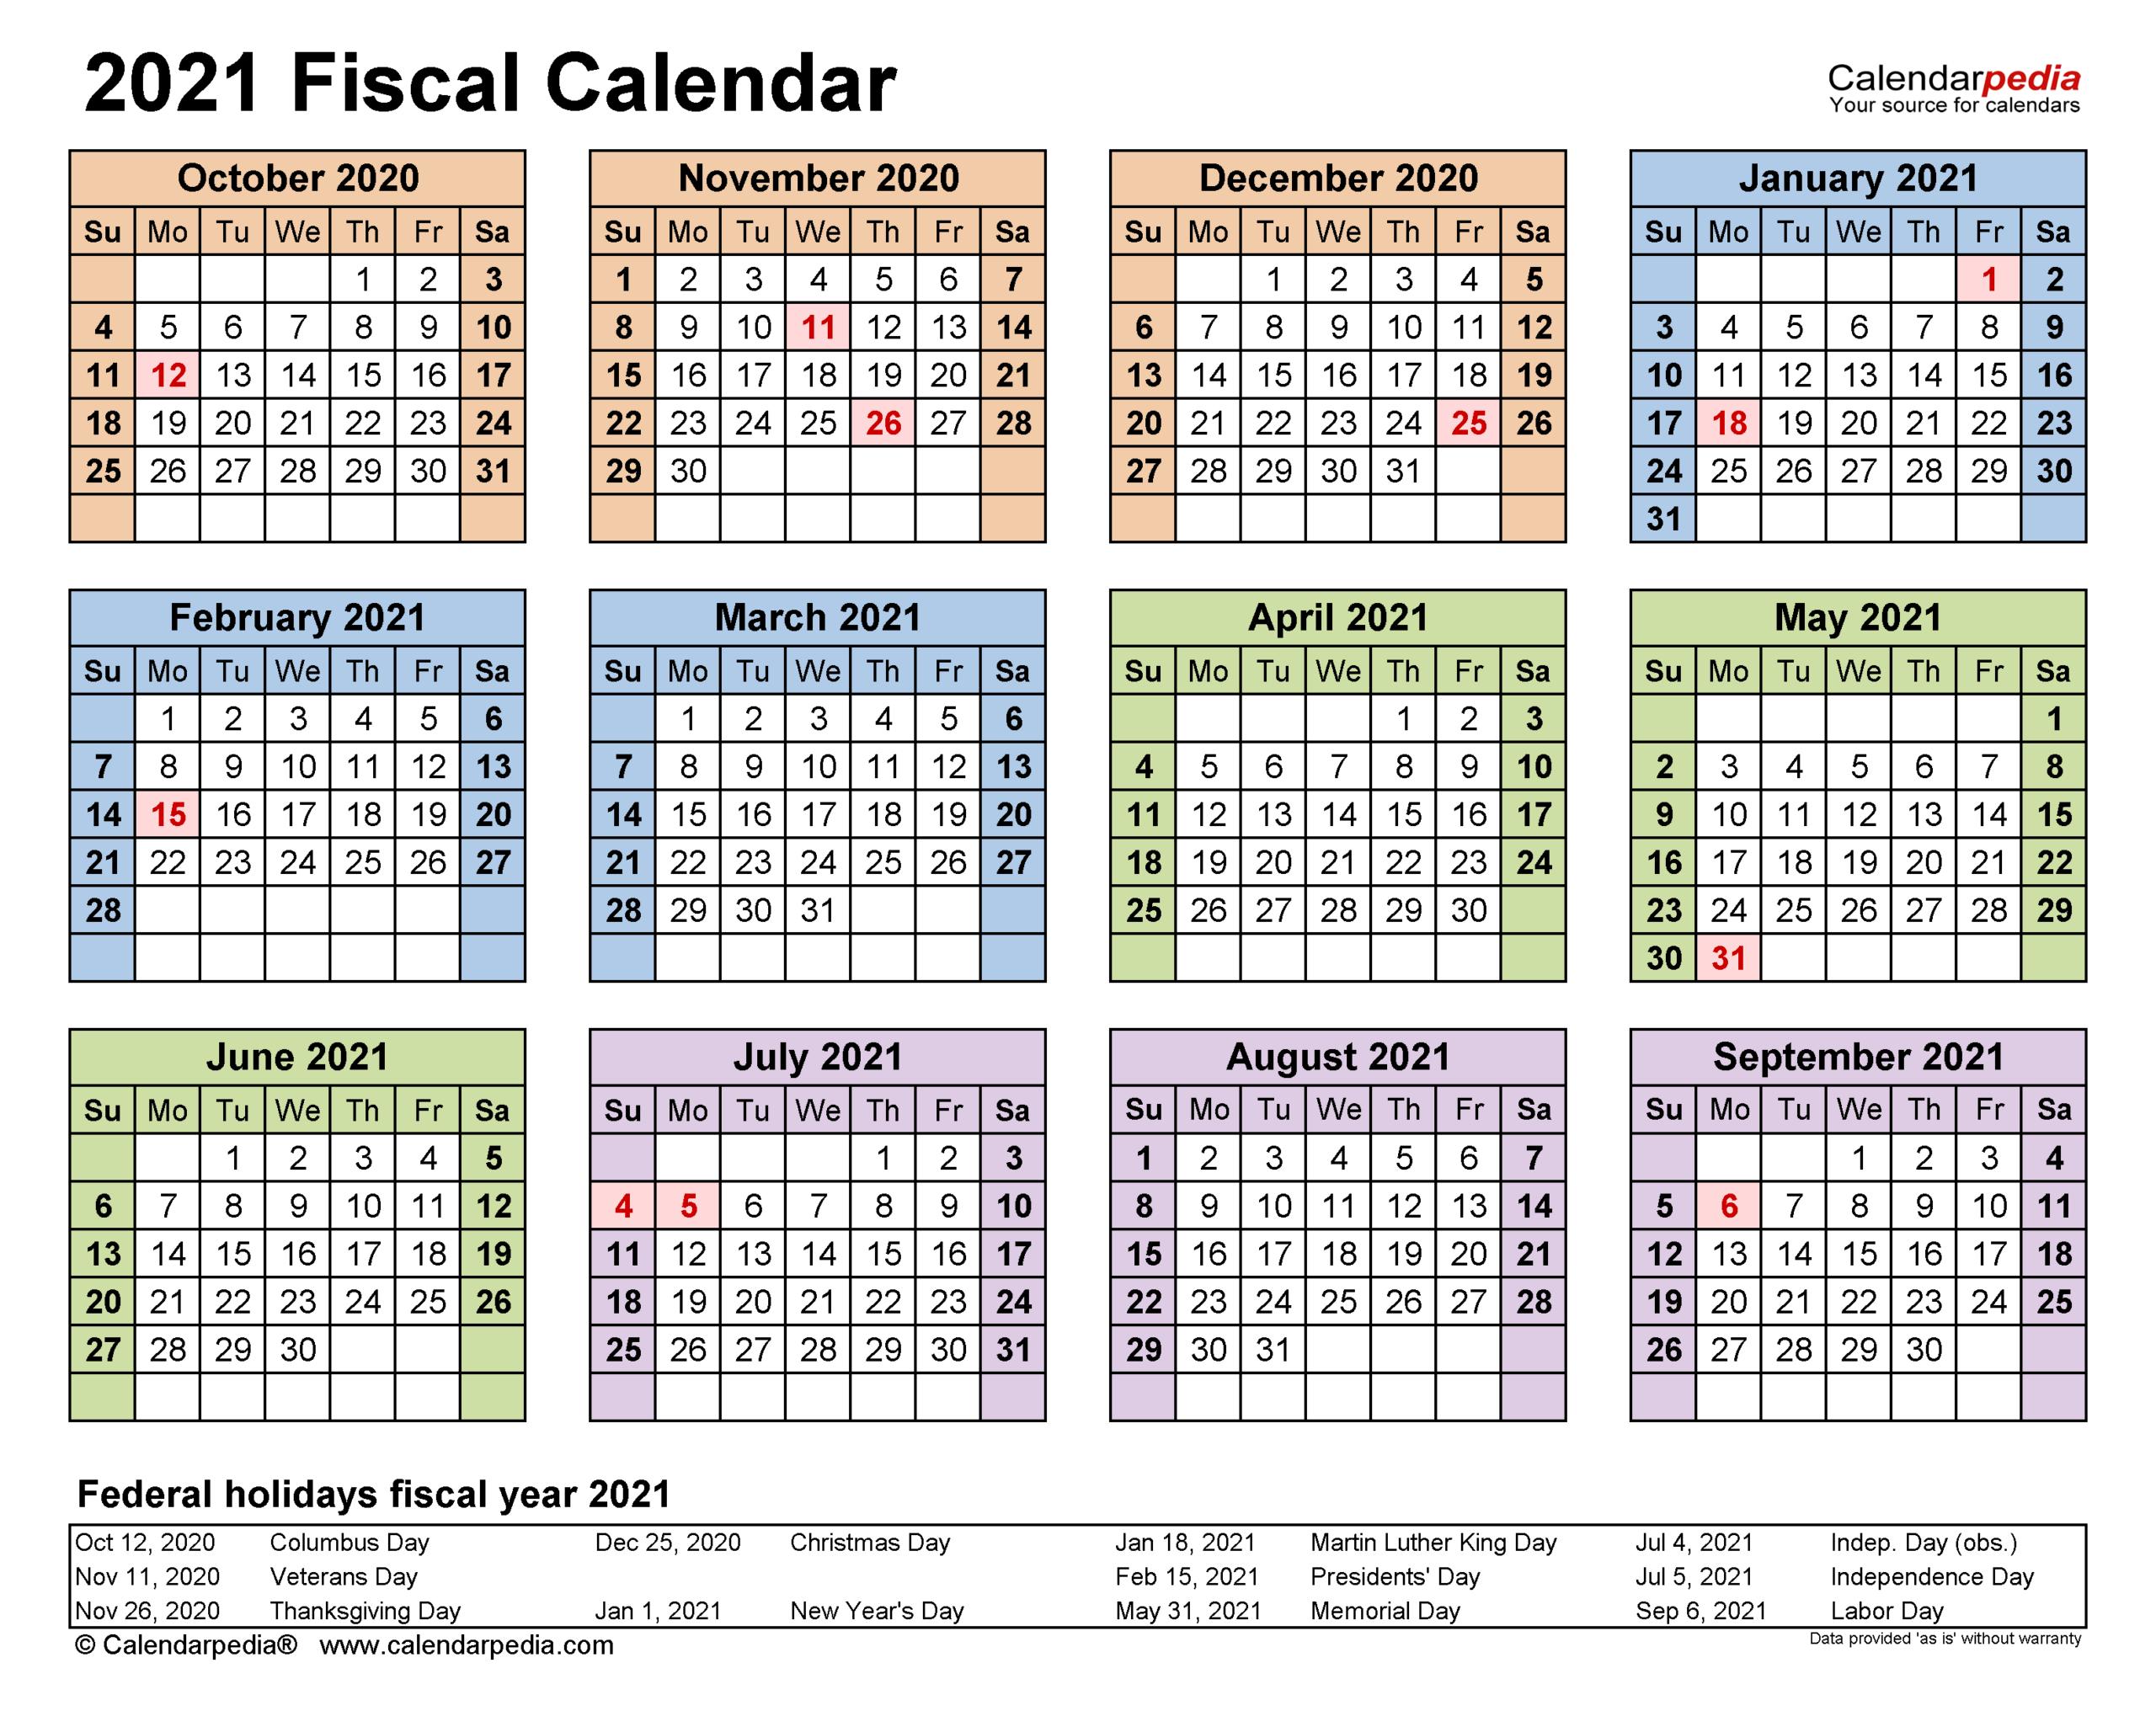 Payroll Calendar 2021 Ontario | Payroll Calendar 2021-2021 Employee Vacation Calendar